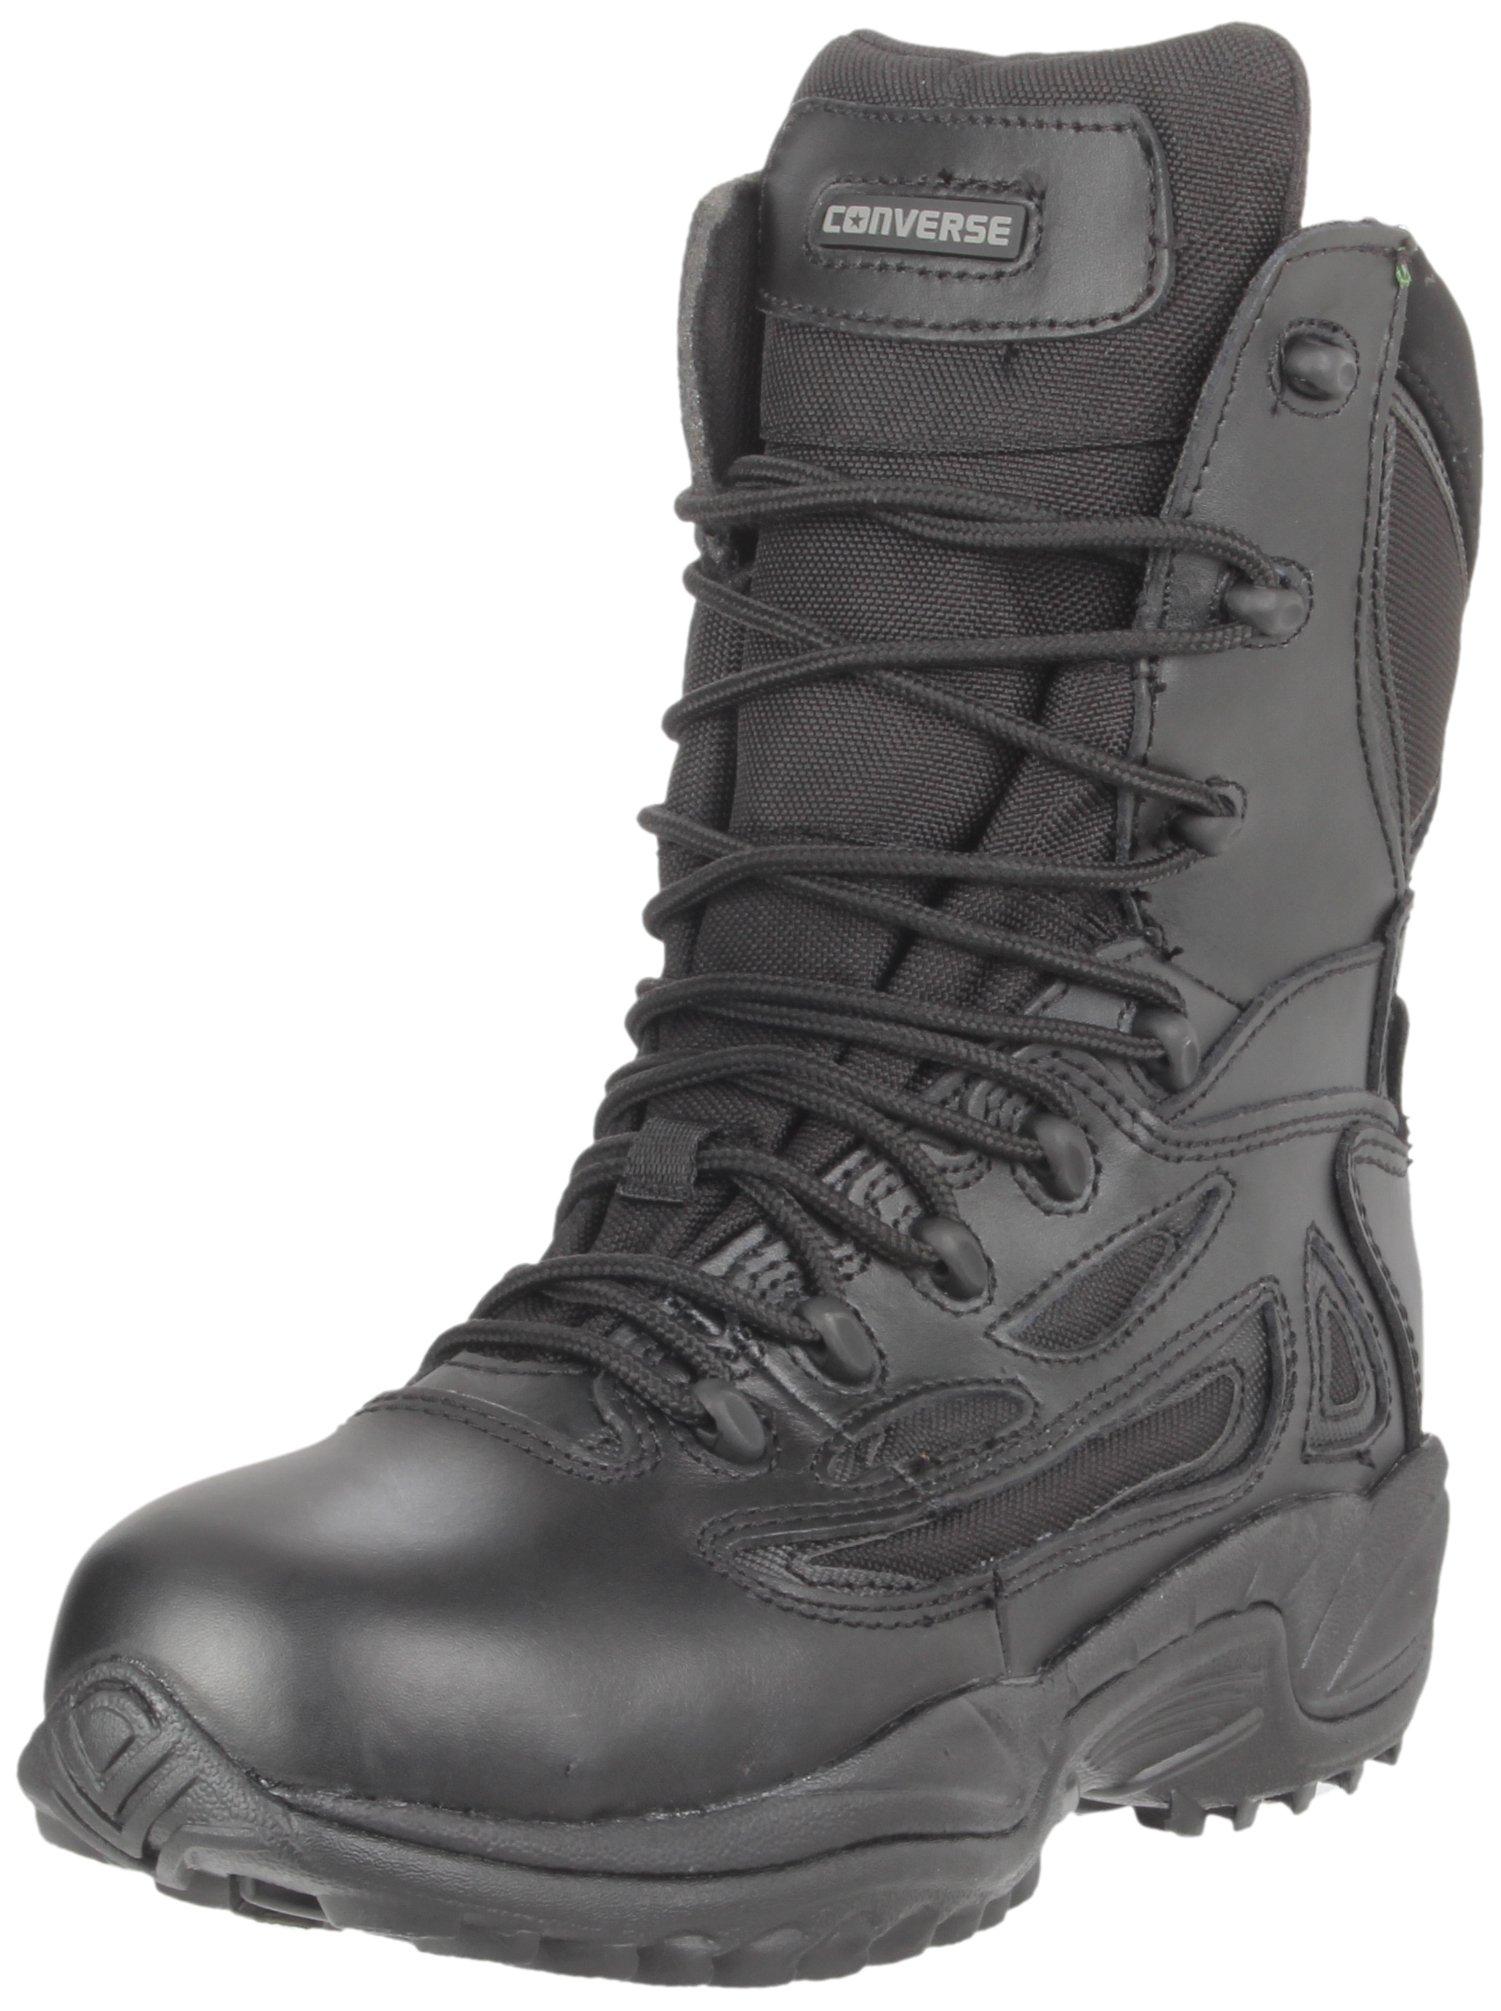 Converse Work Men's C8877 Waterproof Boot,Black,8.5 W US